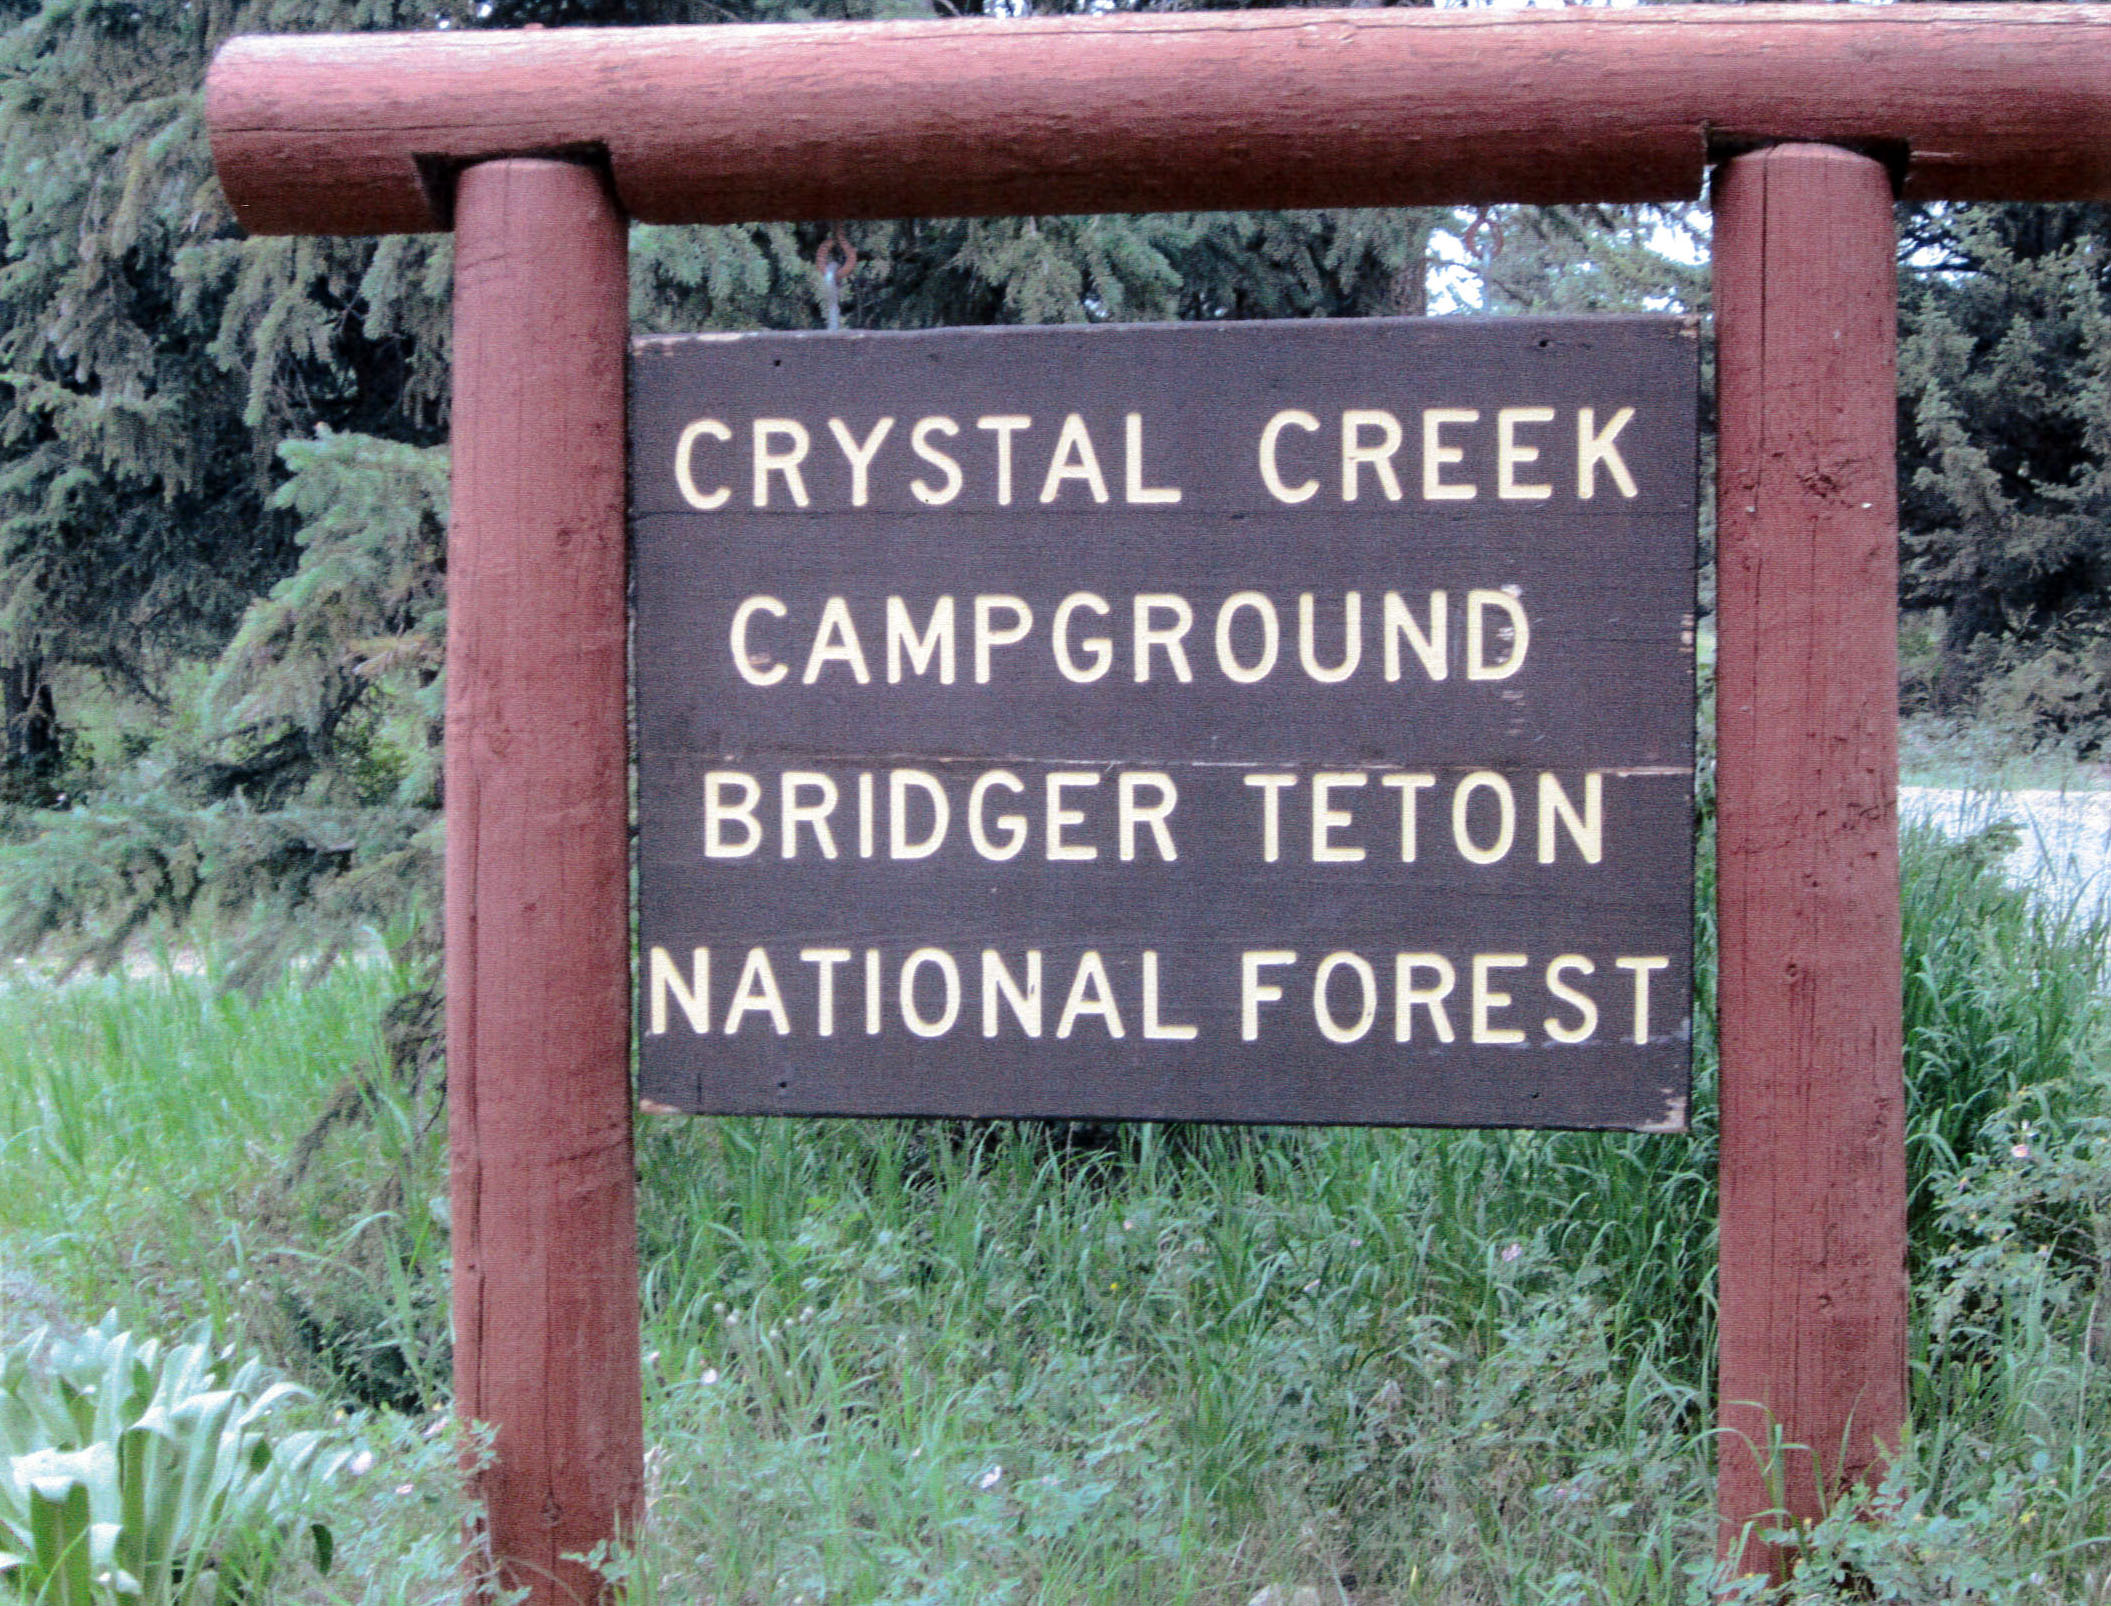 Bridger teton national forest crystal creek campground